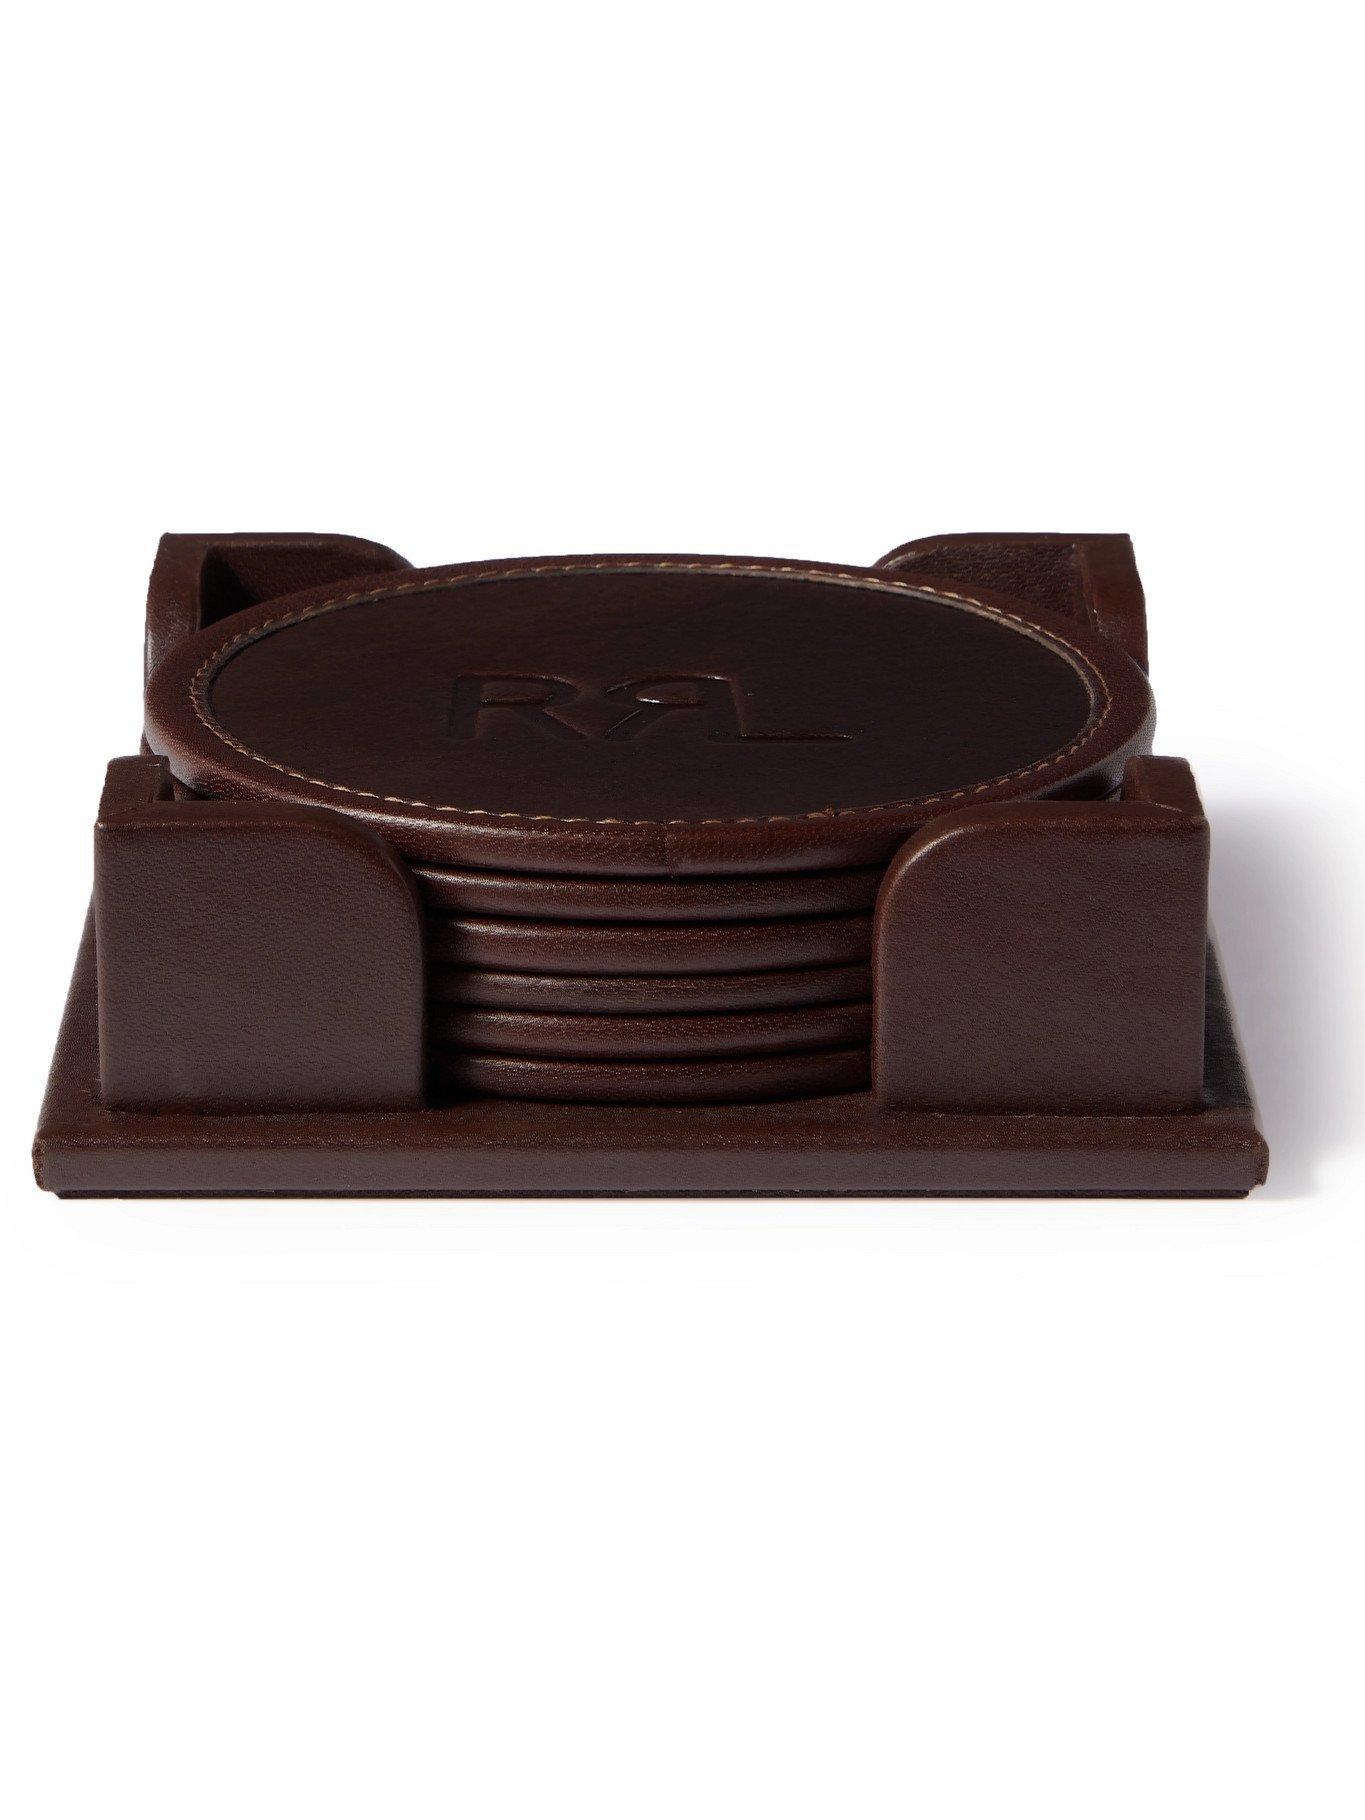 RRL - Set of Six Logo-Debossed Leather Coaster Set - Brown